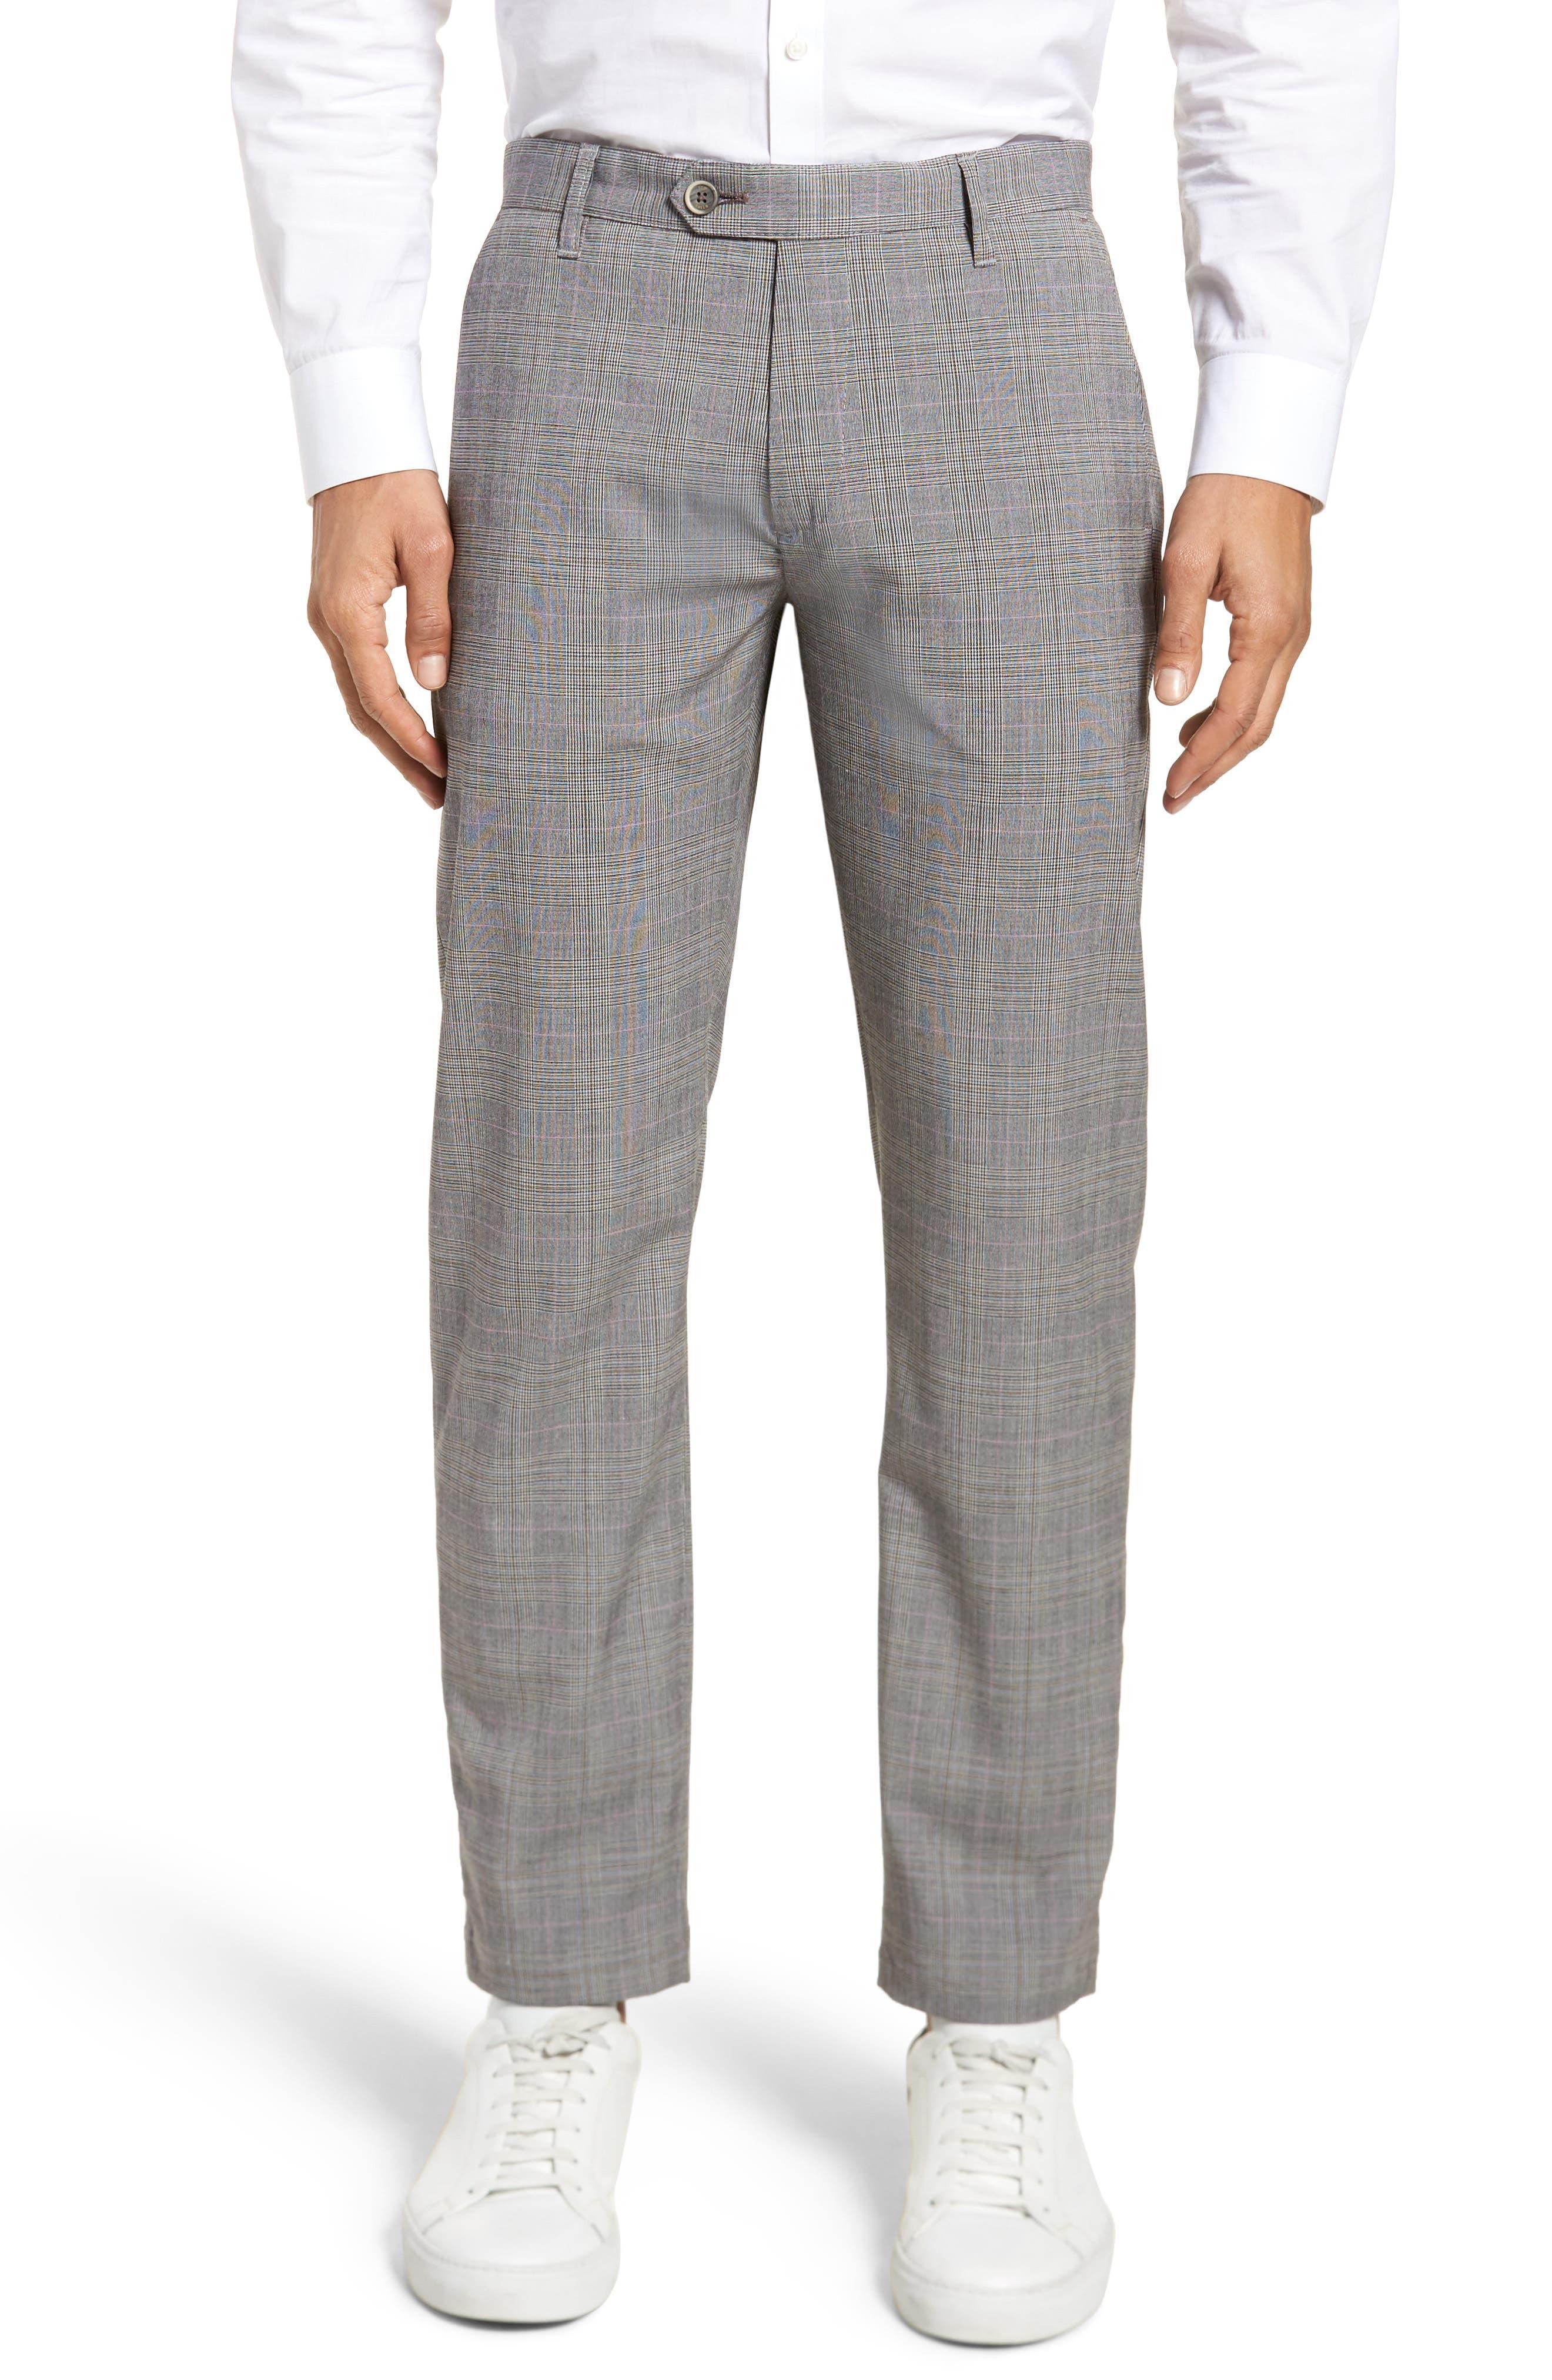 Pants for Men On Sale, Black, polyester, 2017, 32 34 Prada